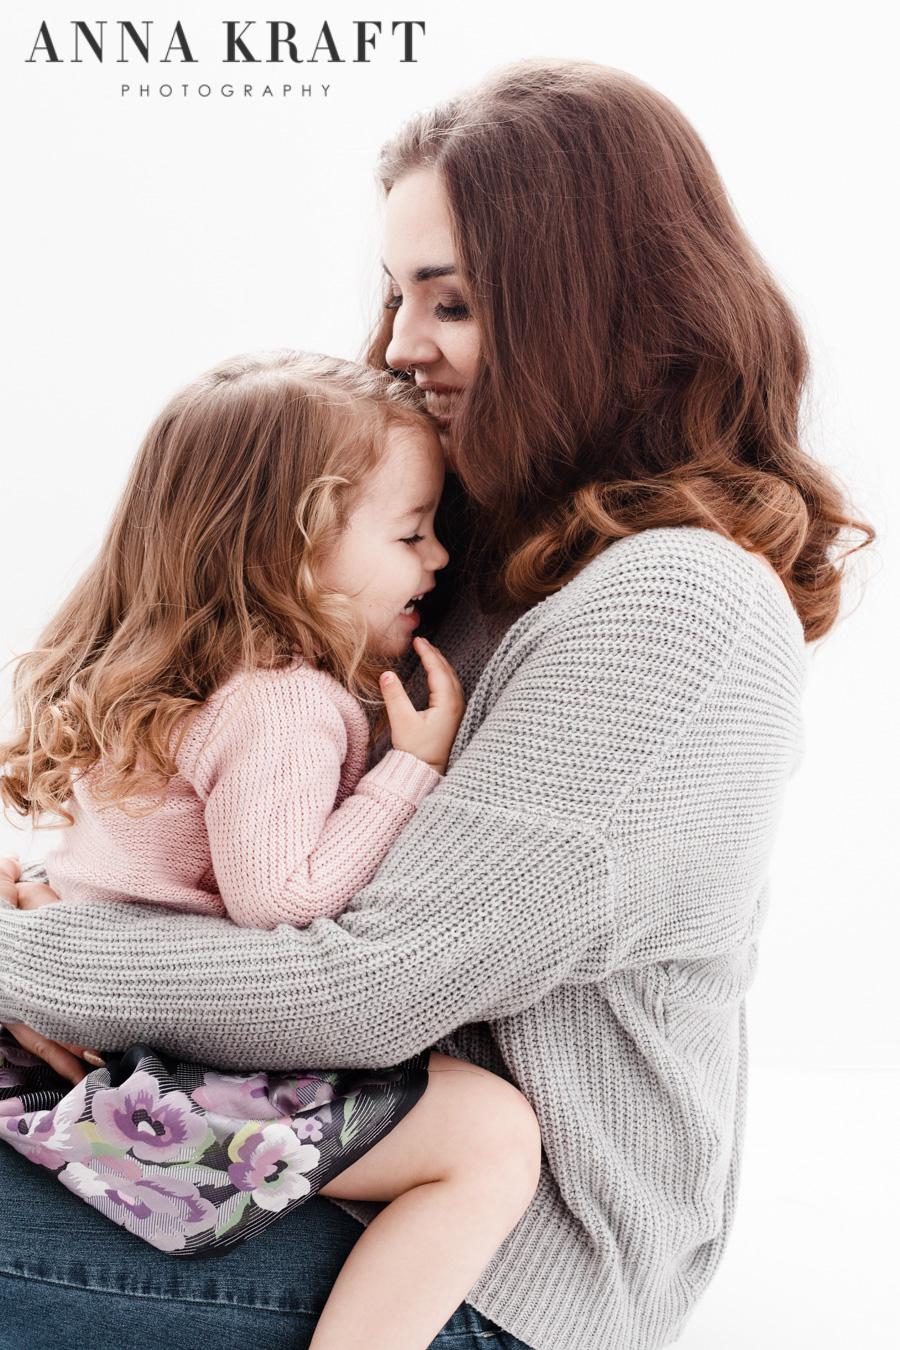 anna_kraft_photography_georgetown_square_studio_family_motherhood_daughter_portrait-5.jpg